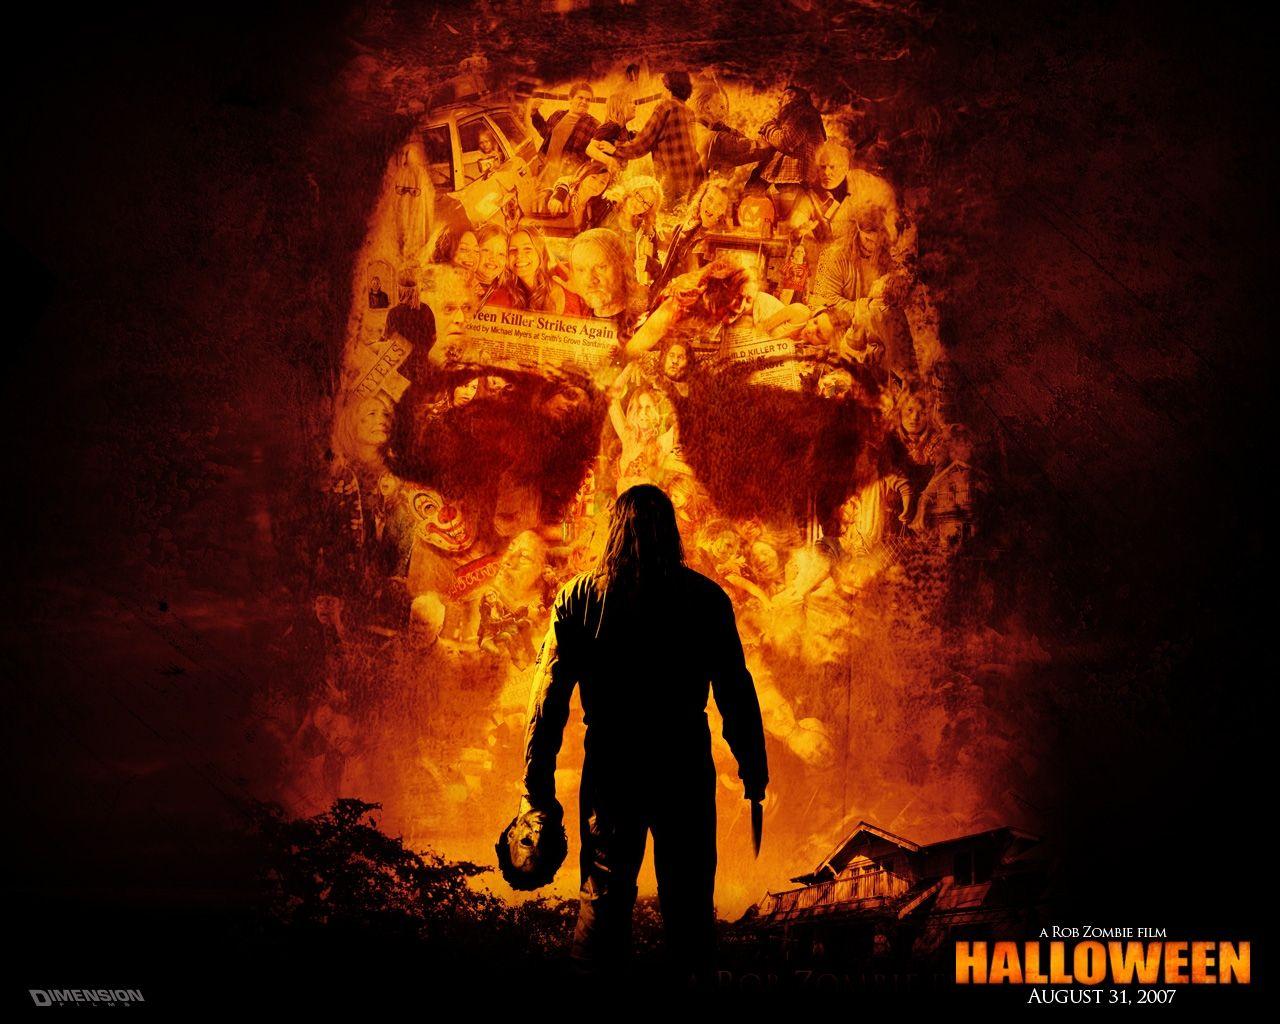 Pin by Micksand on Halloween Rob zombie, Halloween theme